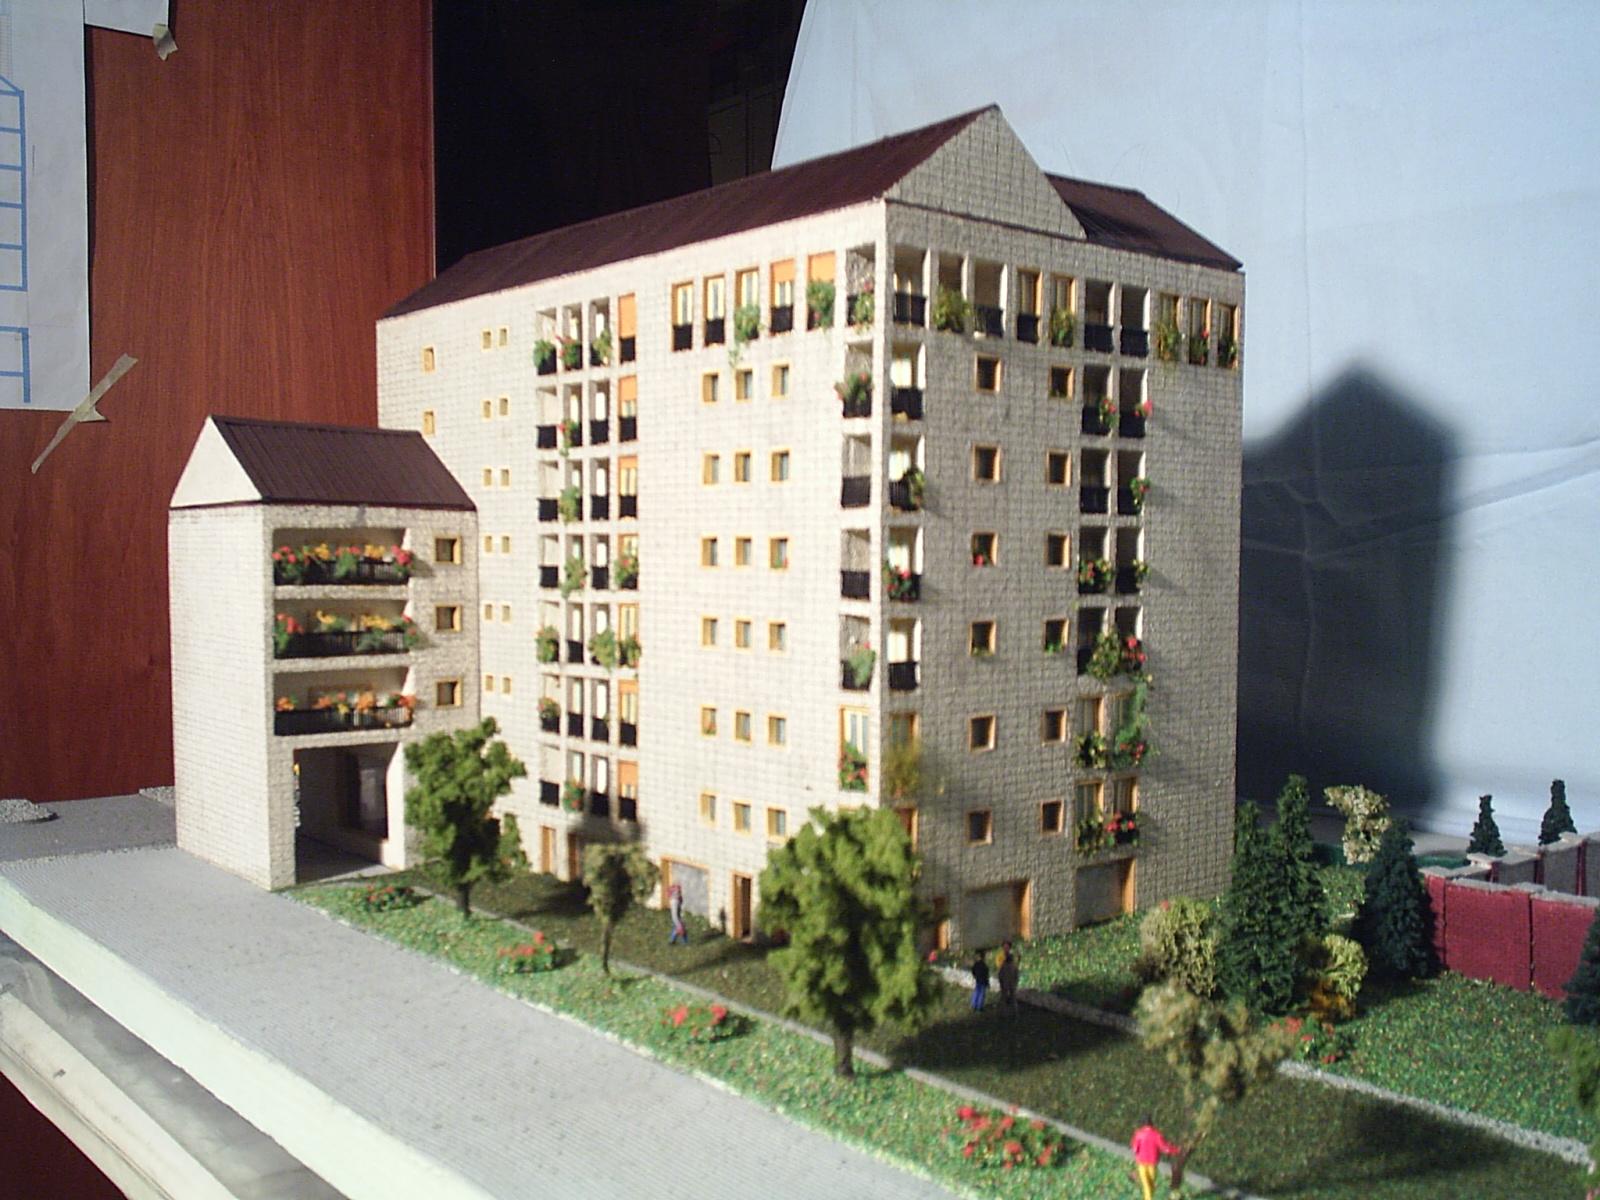 Plastico Architettonico scala 1:100 Viale Palmanova Milano